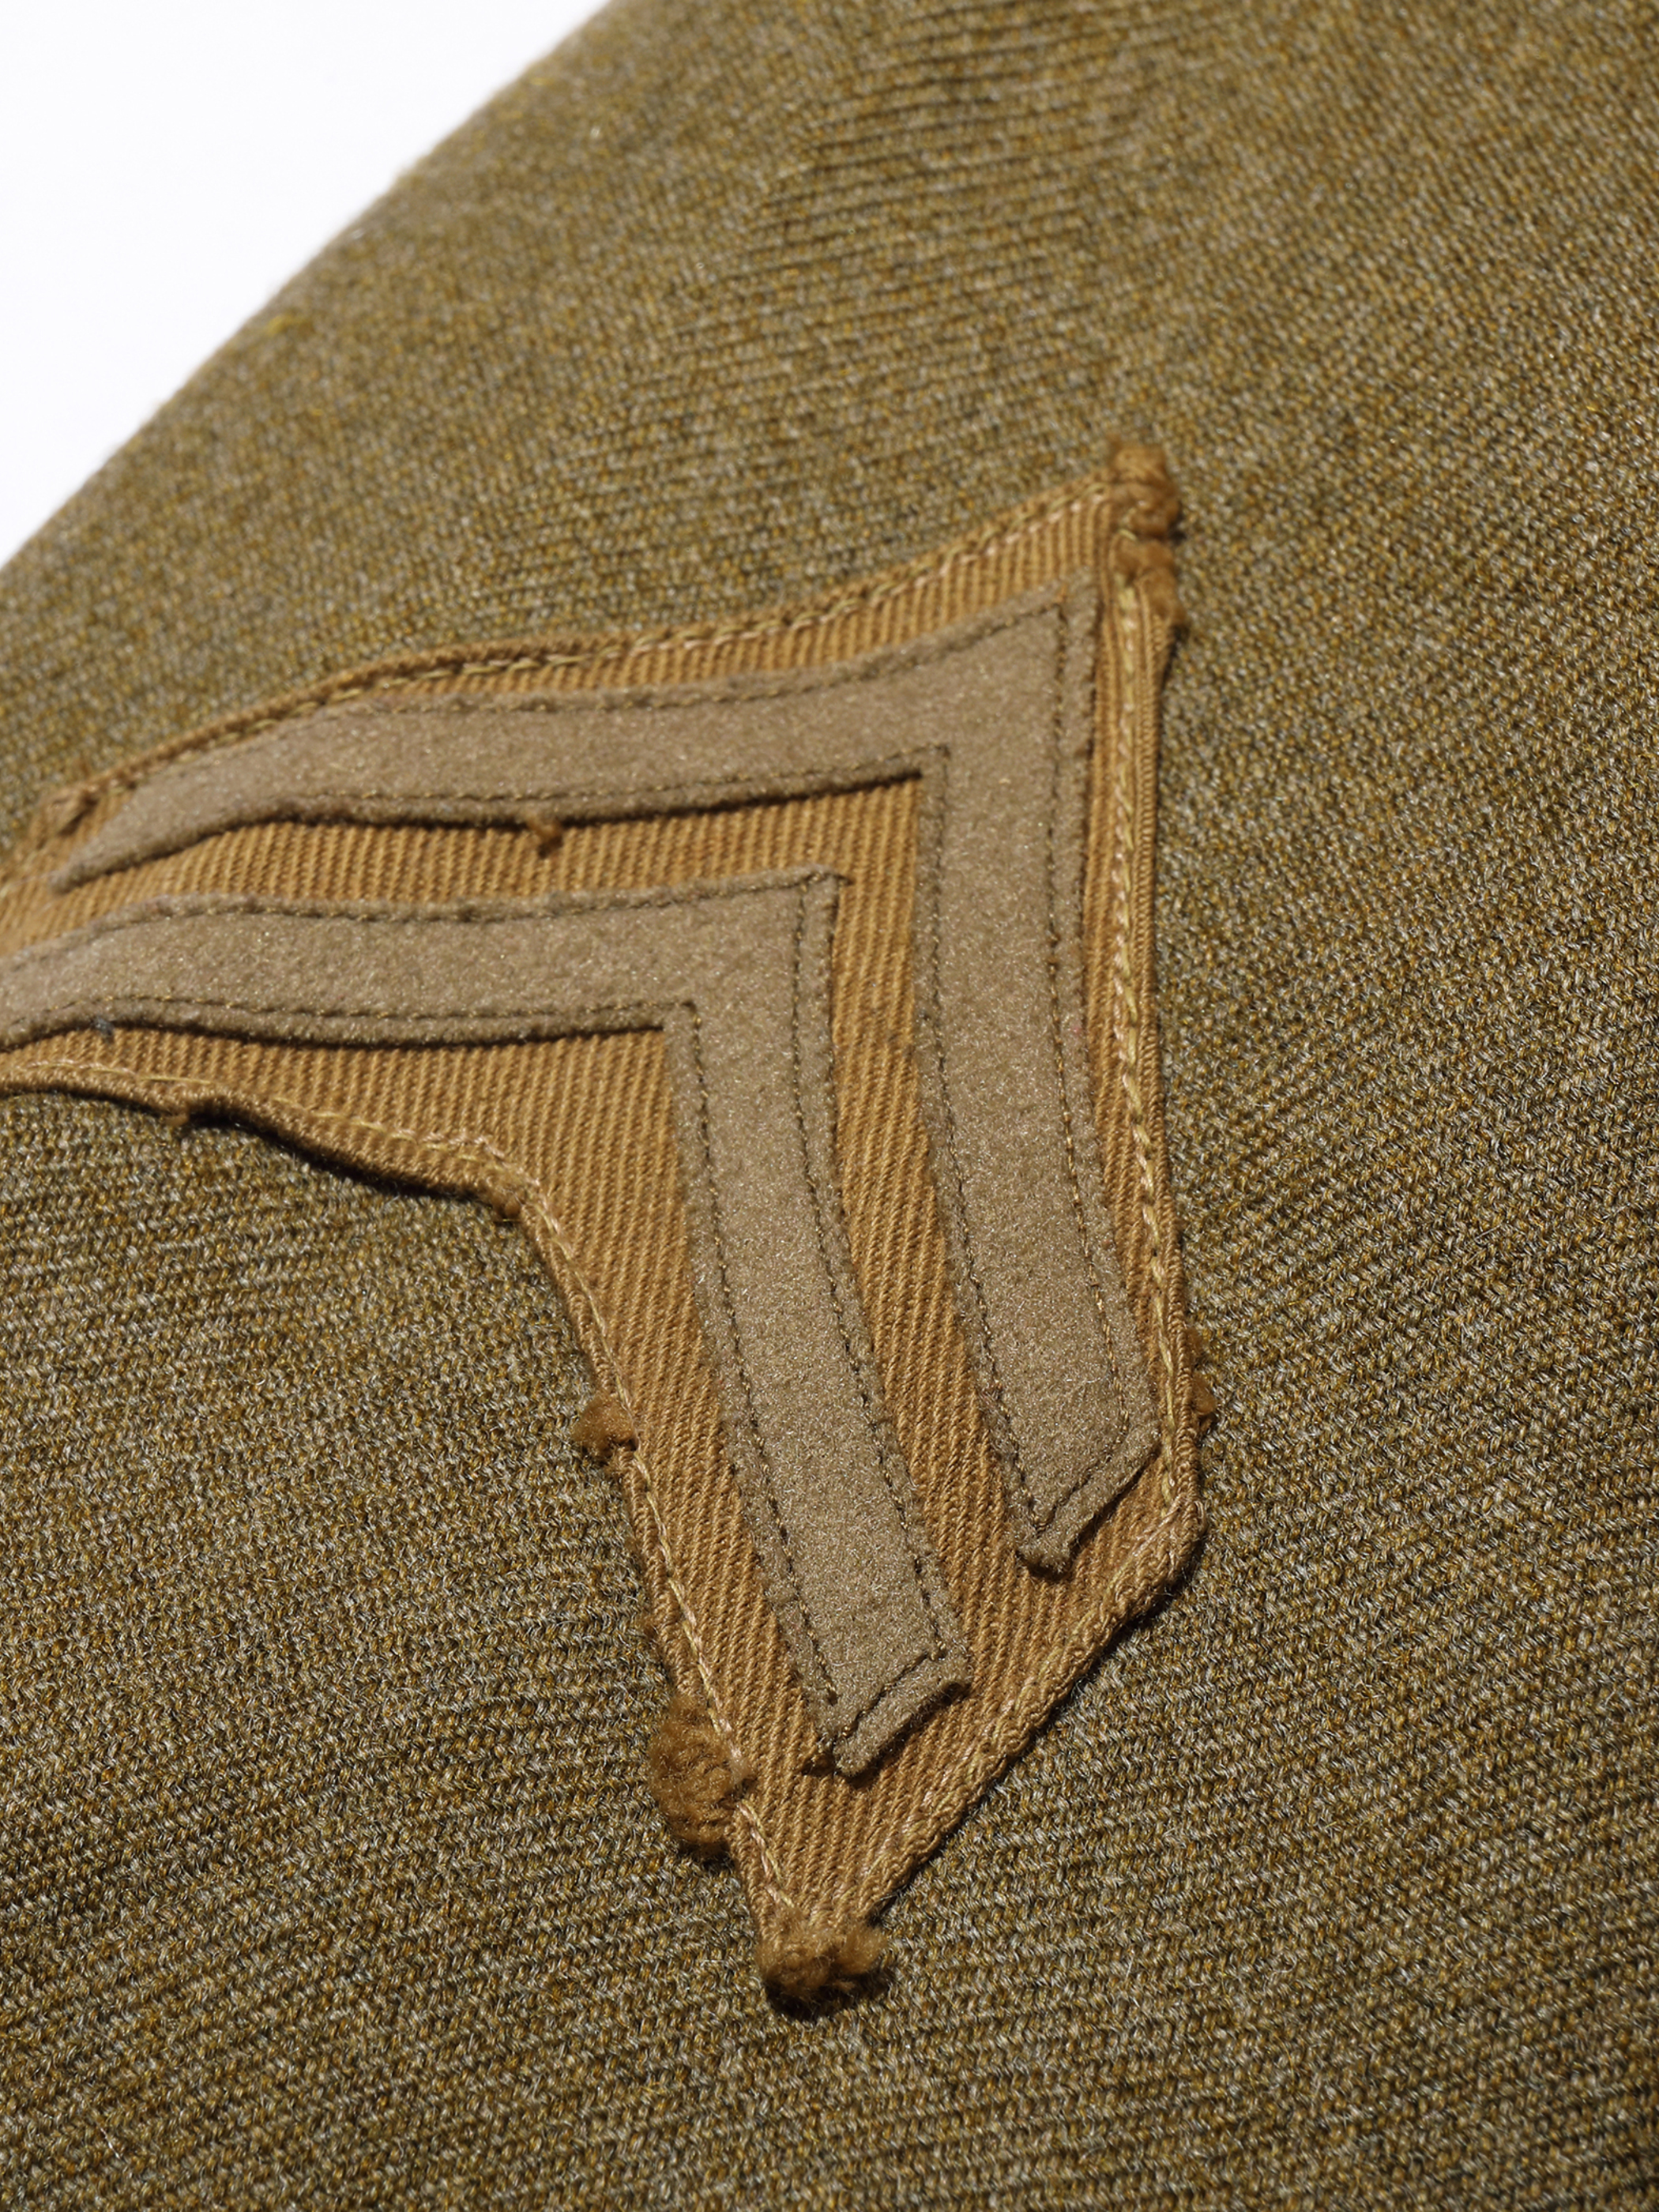 1910's U.S.Army / Combat Field Tunic